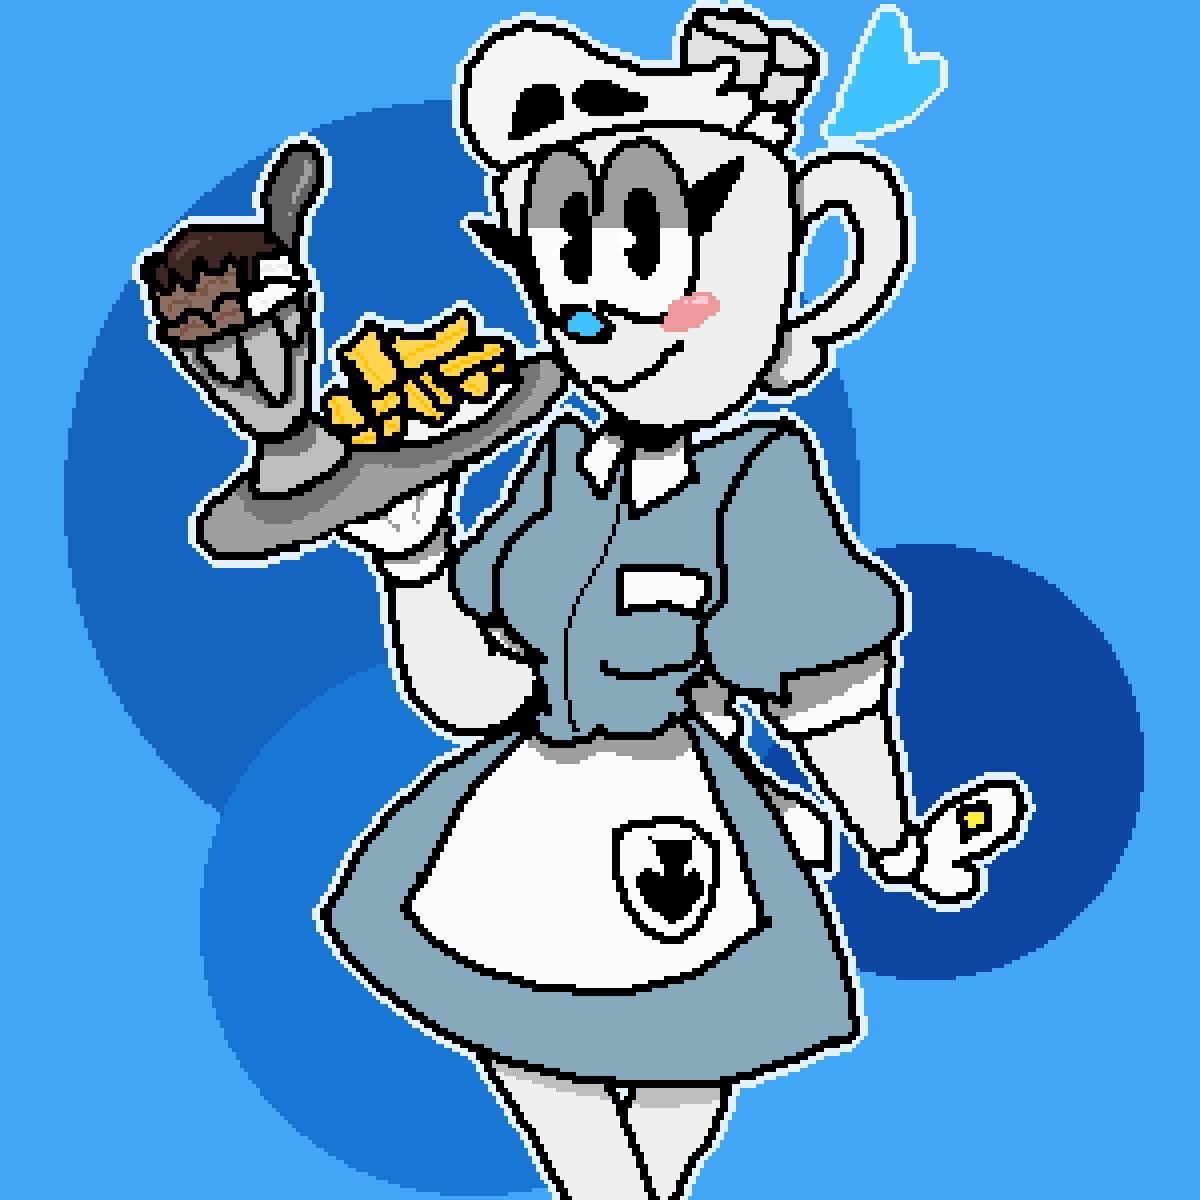 A Sweet Waitress by Bittermeringue